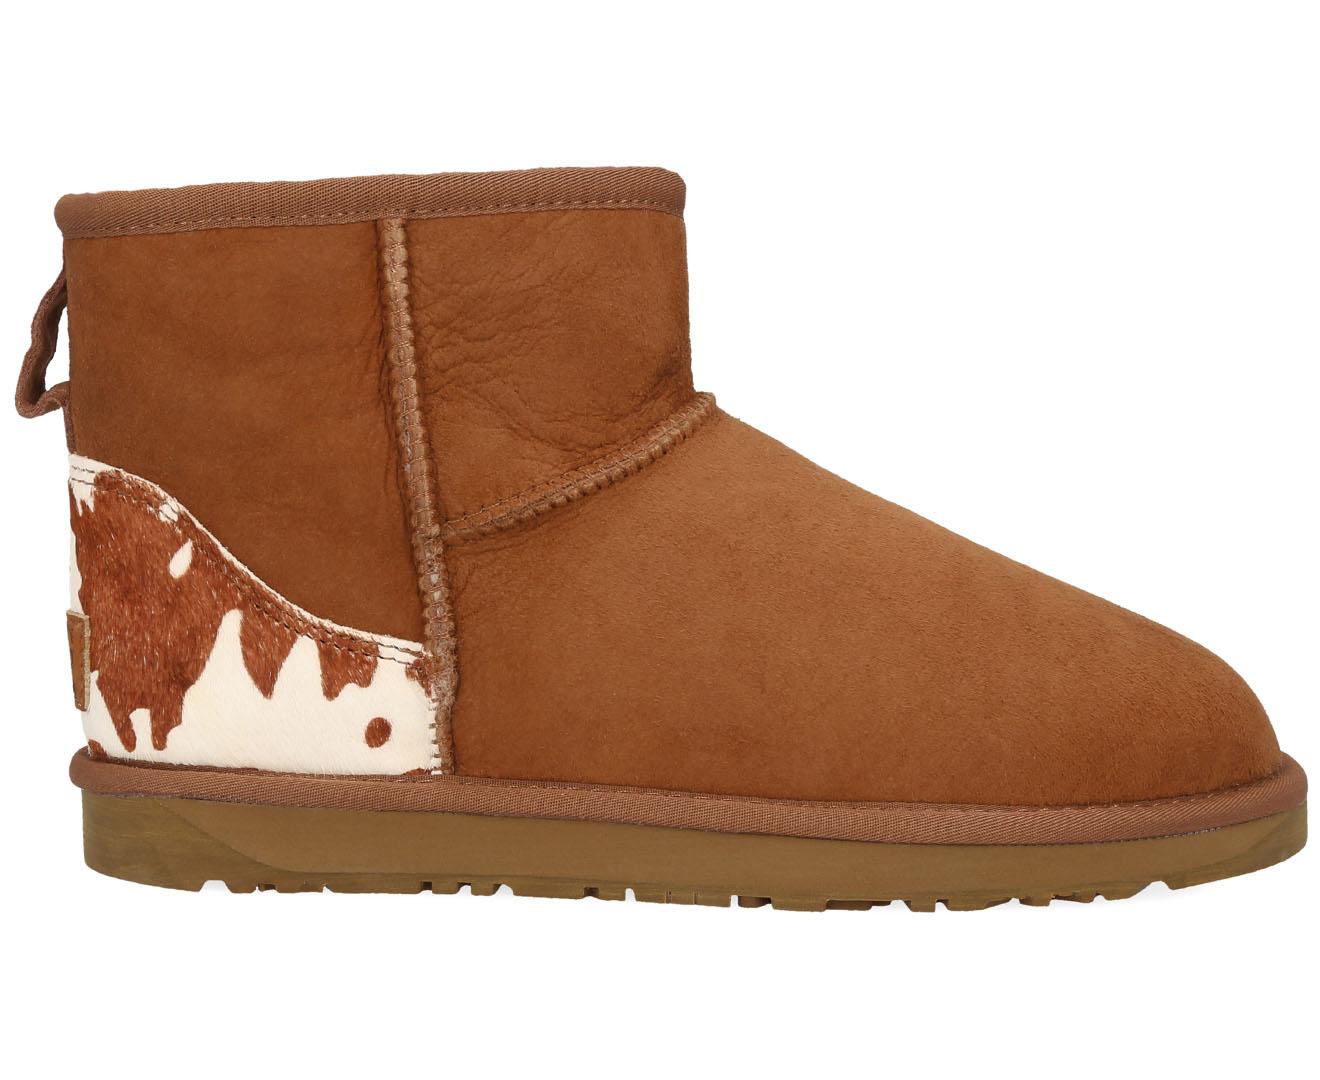 4acad5d4366 Bluestar Women's Premium Australian Sheepskin Ugg Boot - Chestnut Cow